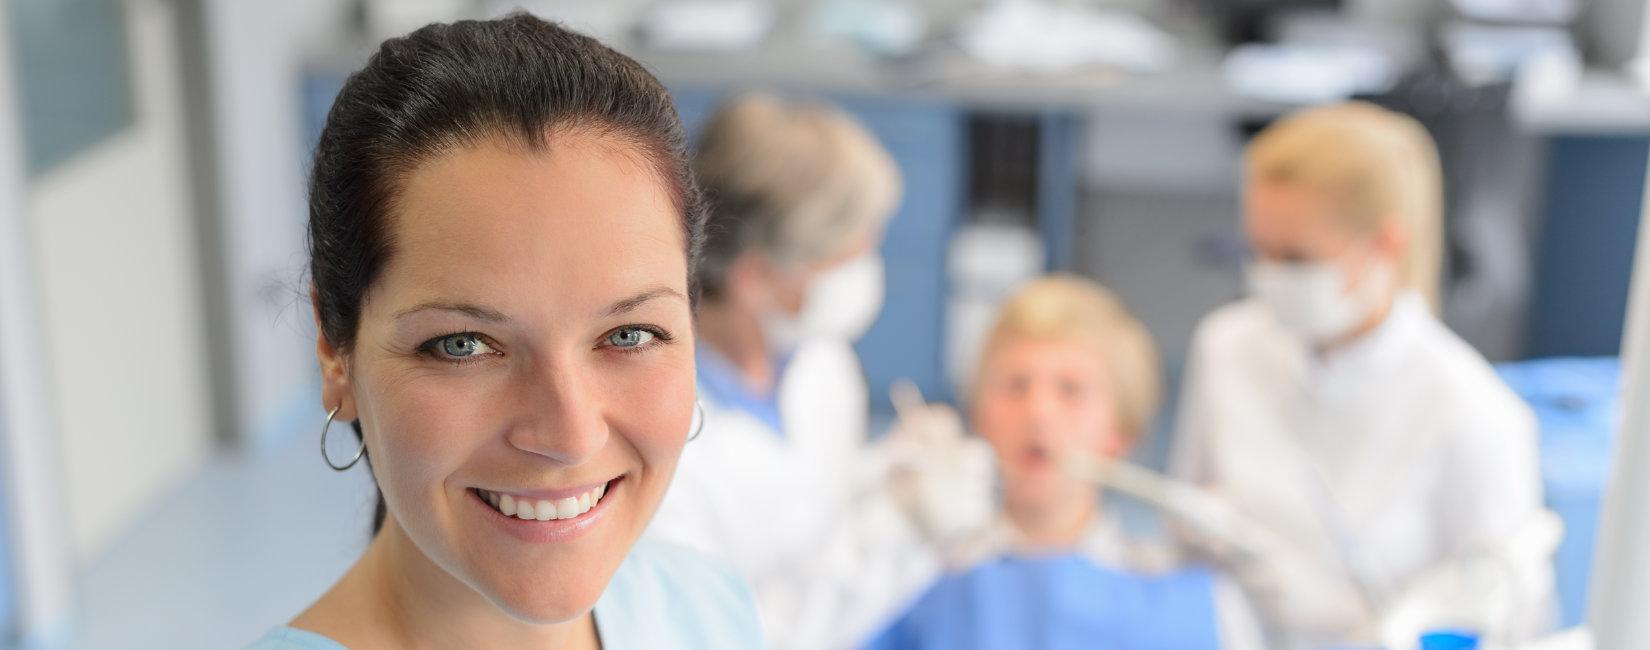 Basic life support training ideal for dentists, dental nurses & hygienists